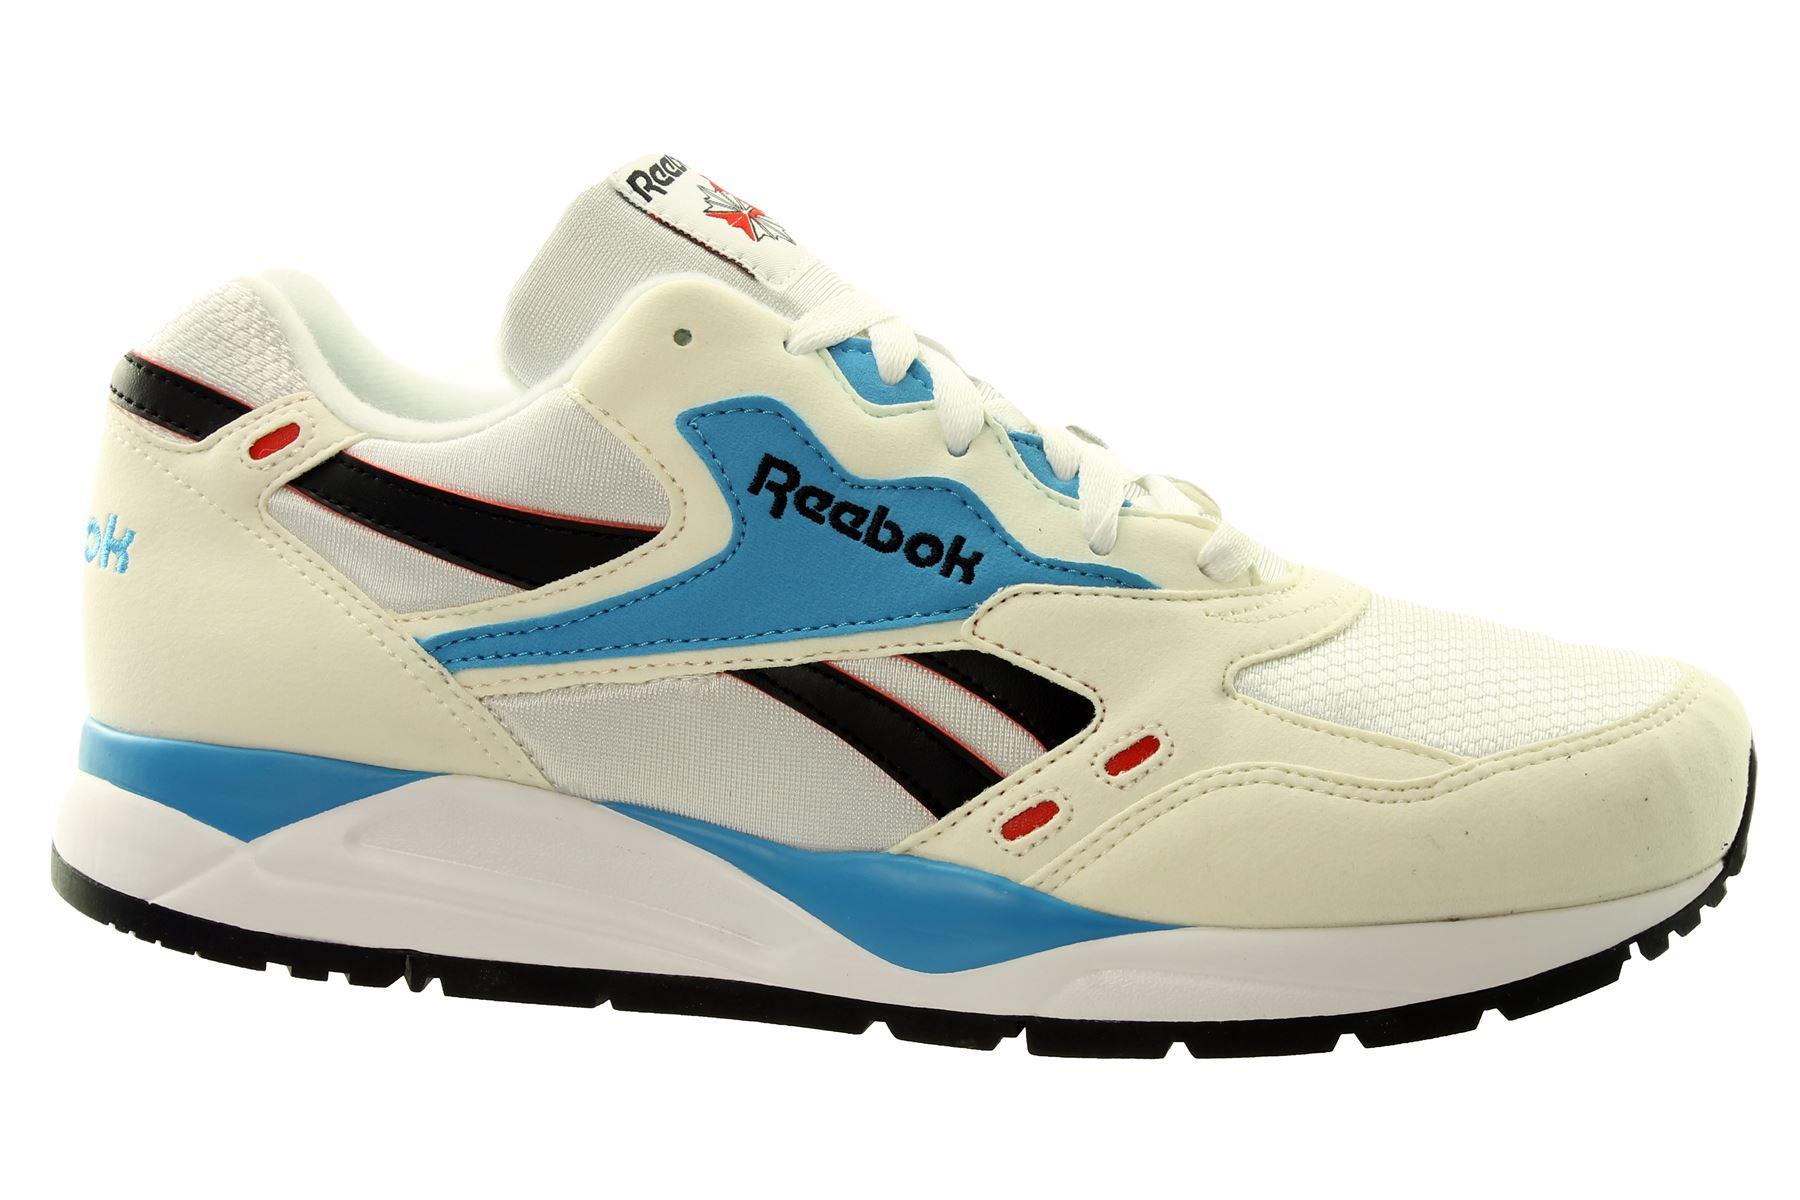 reebok uk. Reebok-Bolton-Mens-Trainers-RRP-75-SIZES-UK- Reebok Uk